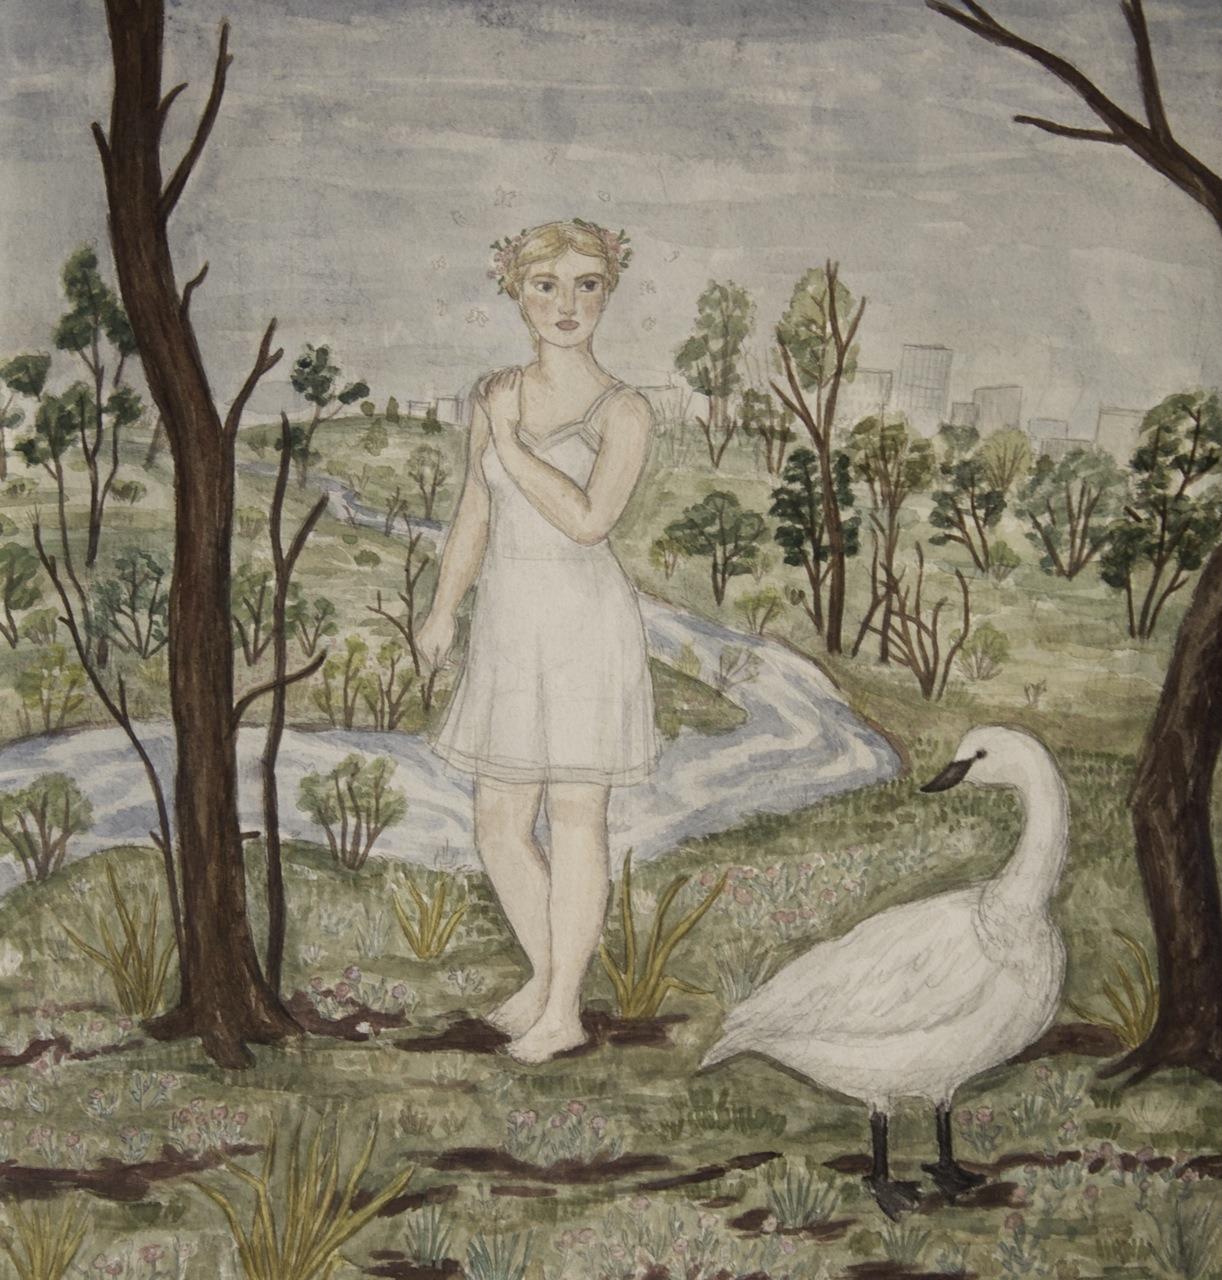 Leda and the swan, Pearl Beerhorst, watercolor, 2014